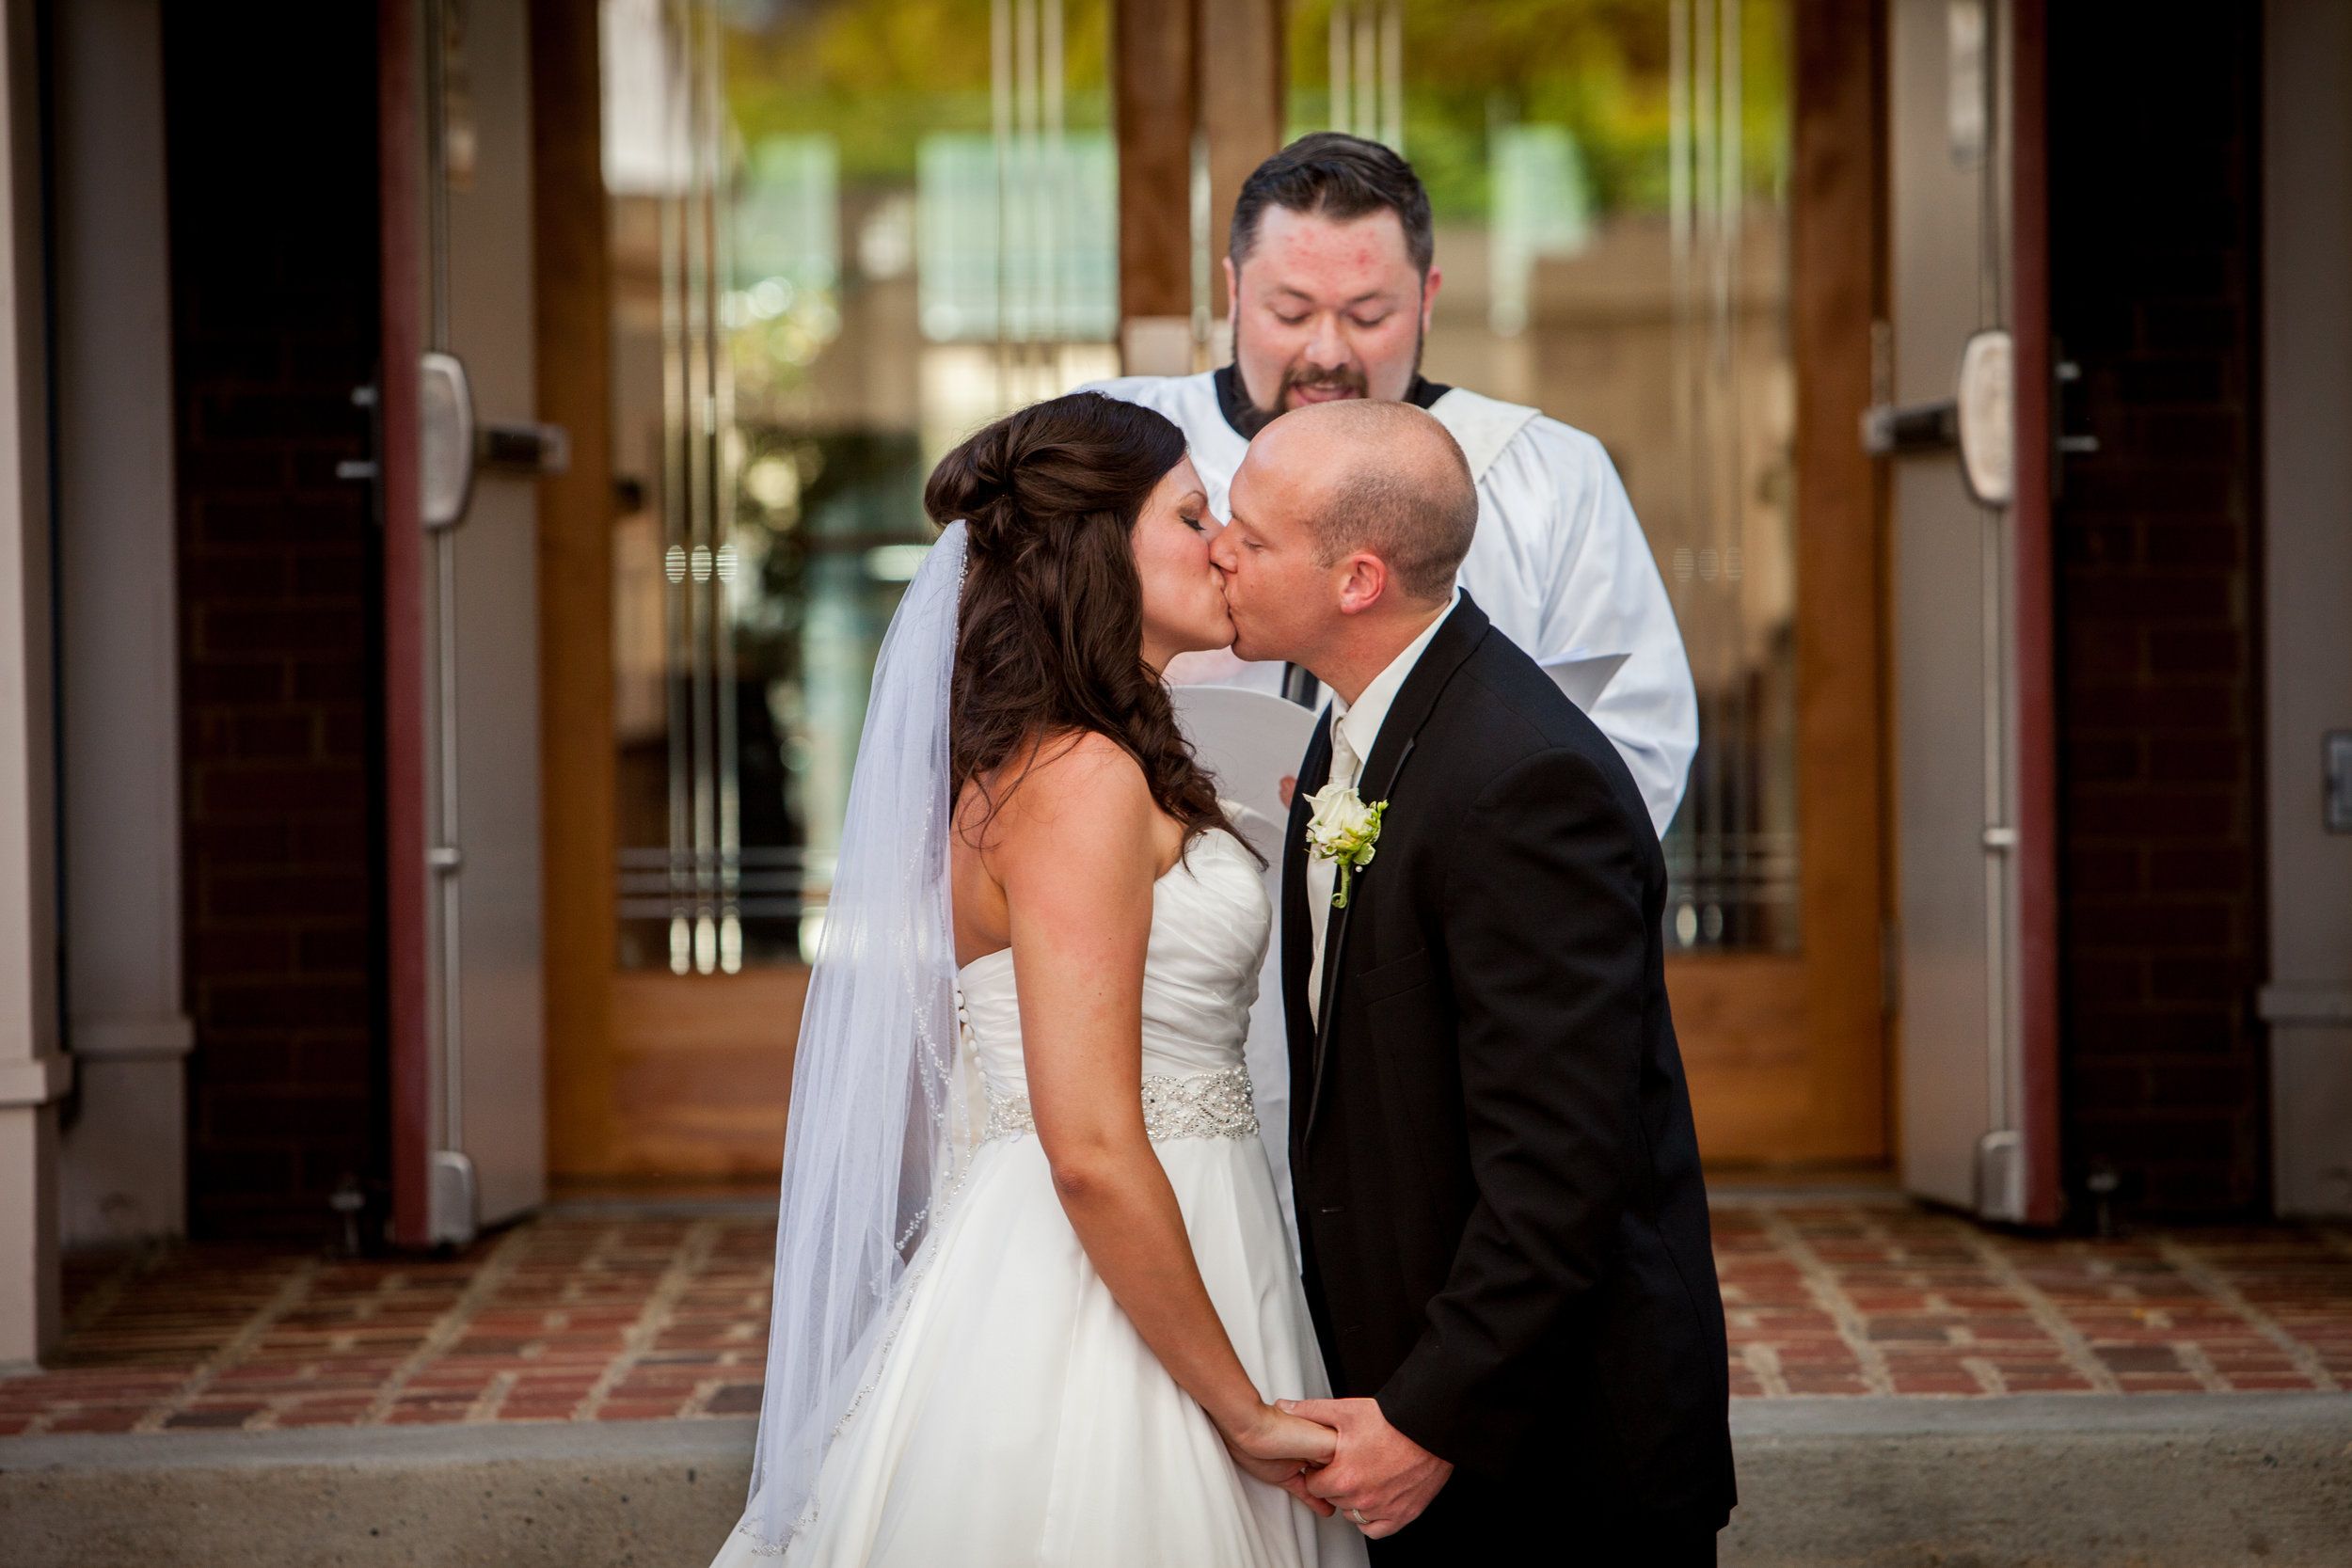 Ceremony-Kiss-Glen-Allen-Cultural-Center.jpg